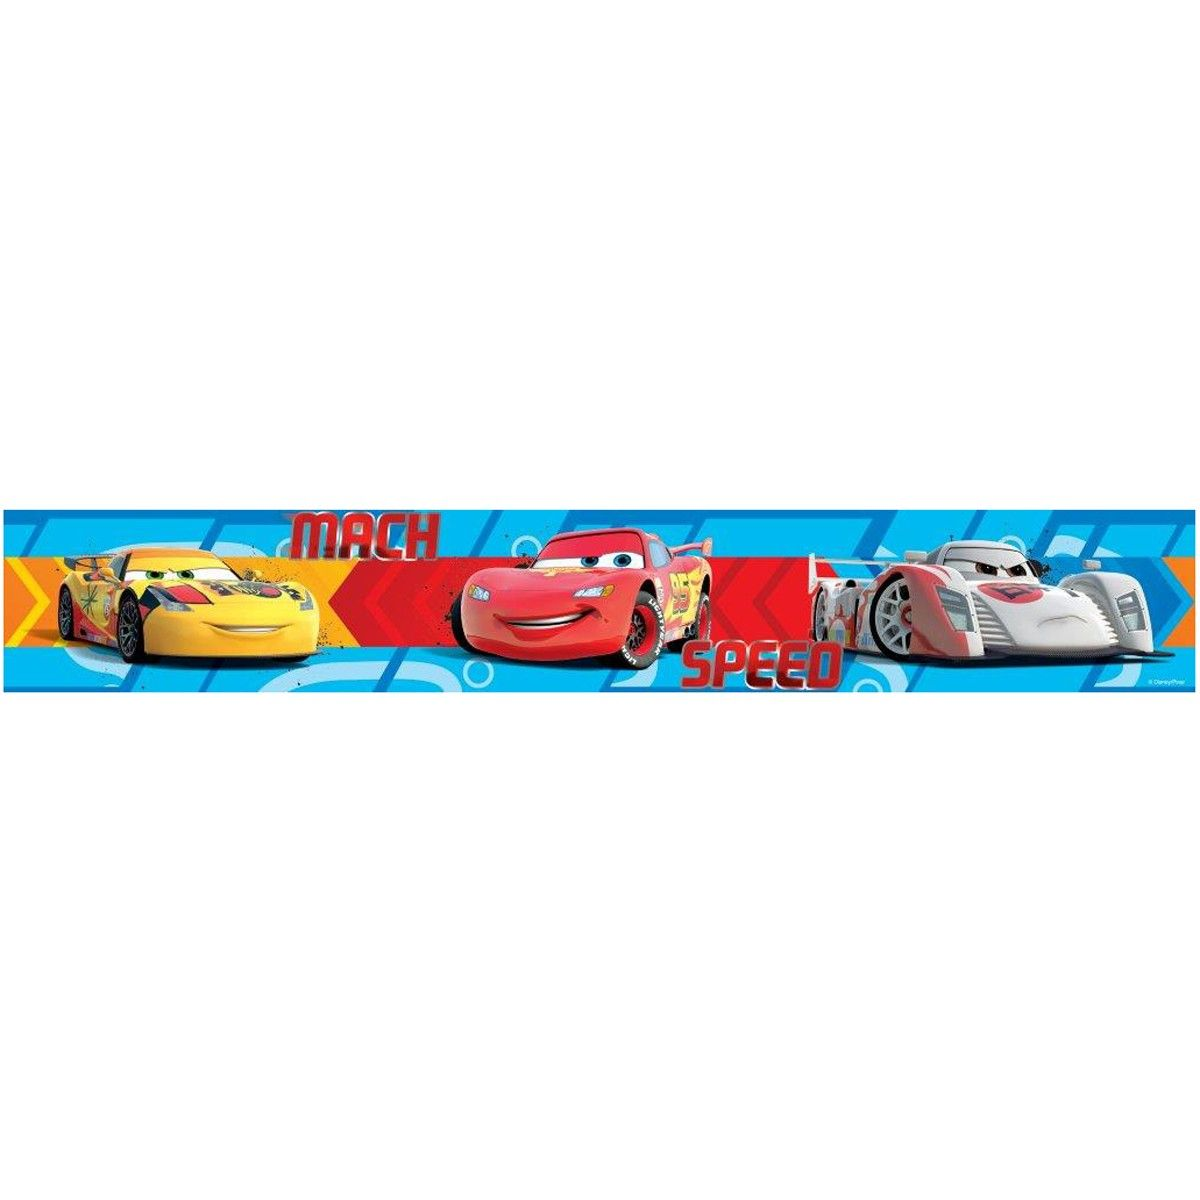 Disney Cars Speed Self Adhesive Wallpaper Border 5m